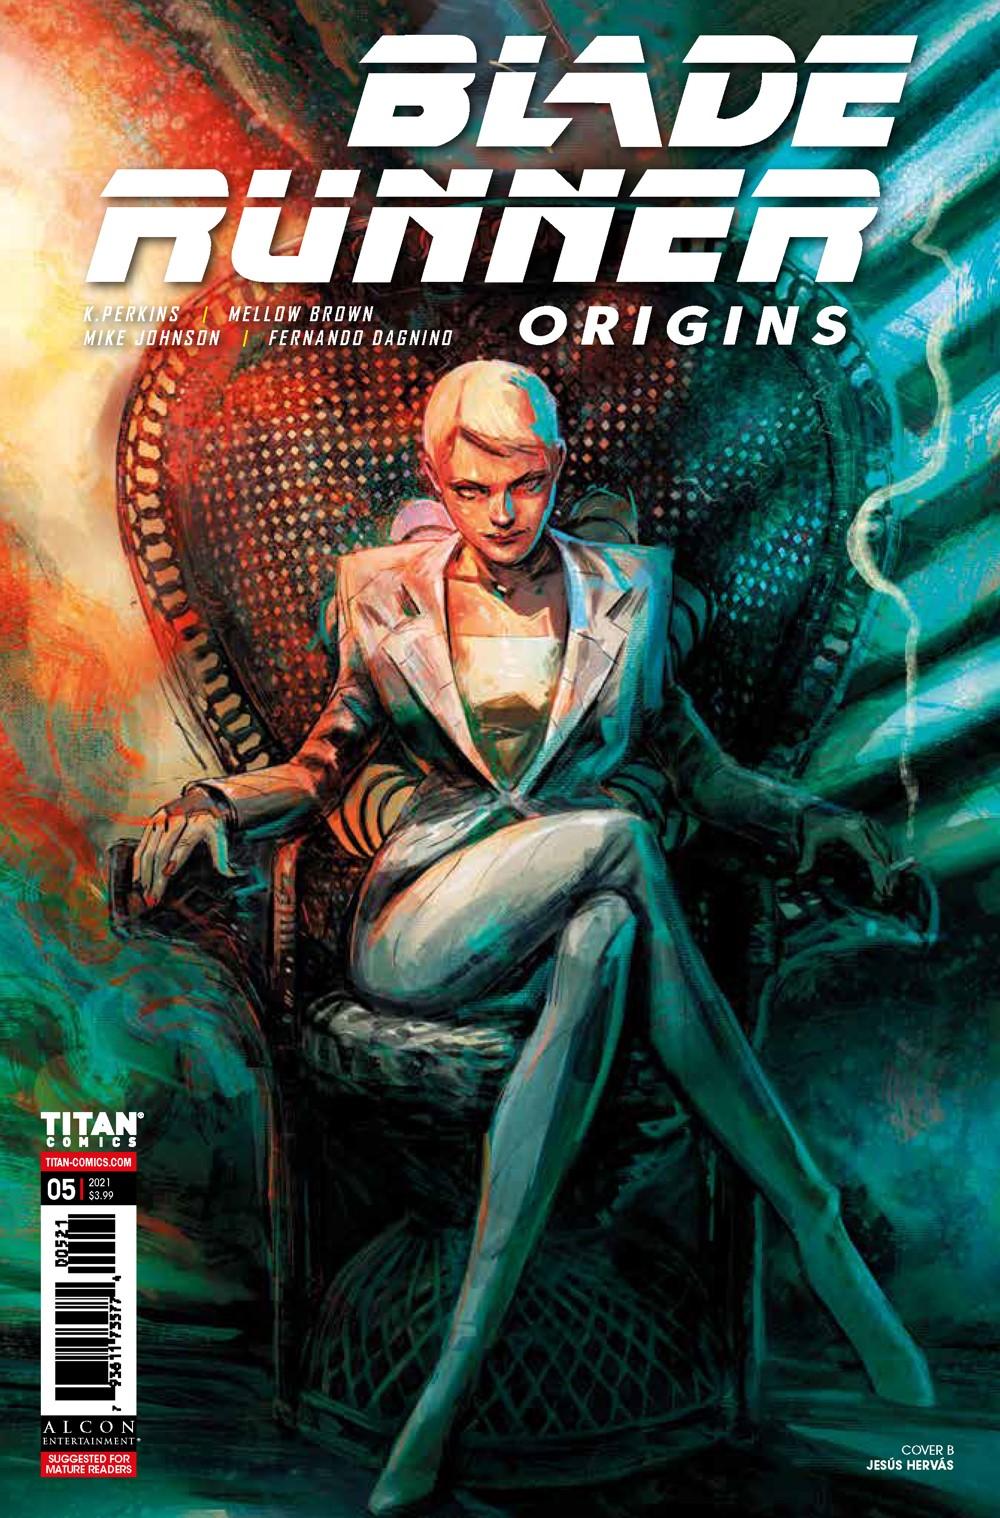 Blade_Runner_Origins_5_COVERS_B ComicList Previews: BLADE RUNNER ORIGINS #5